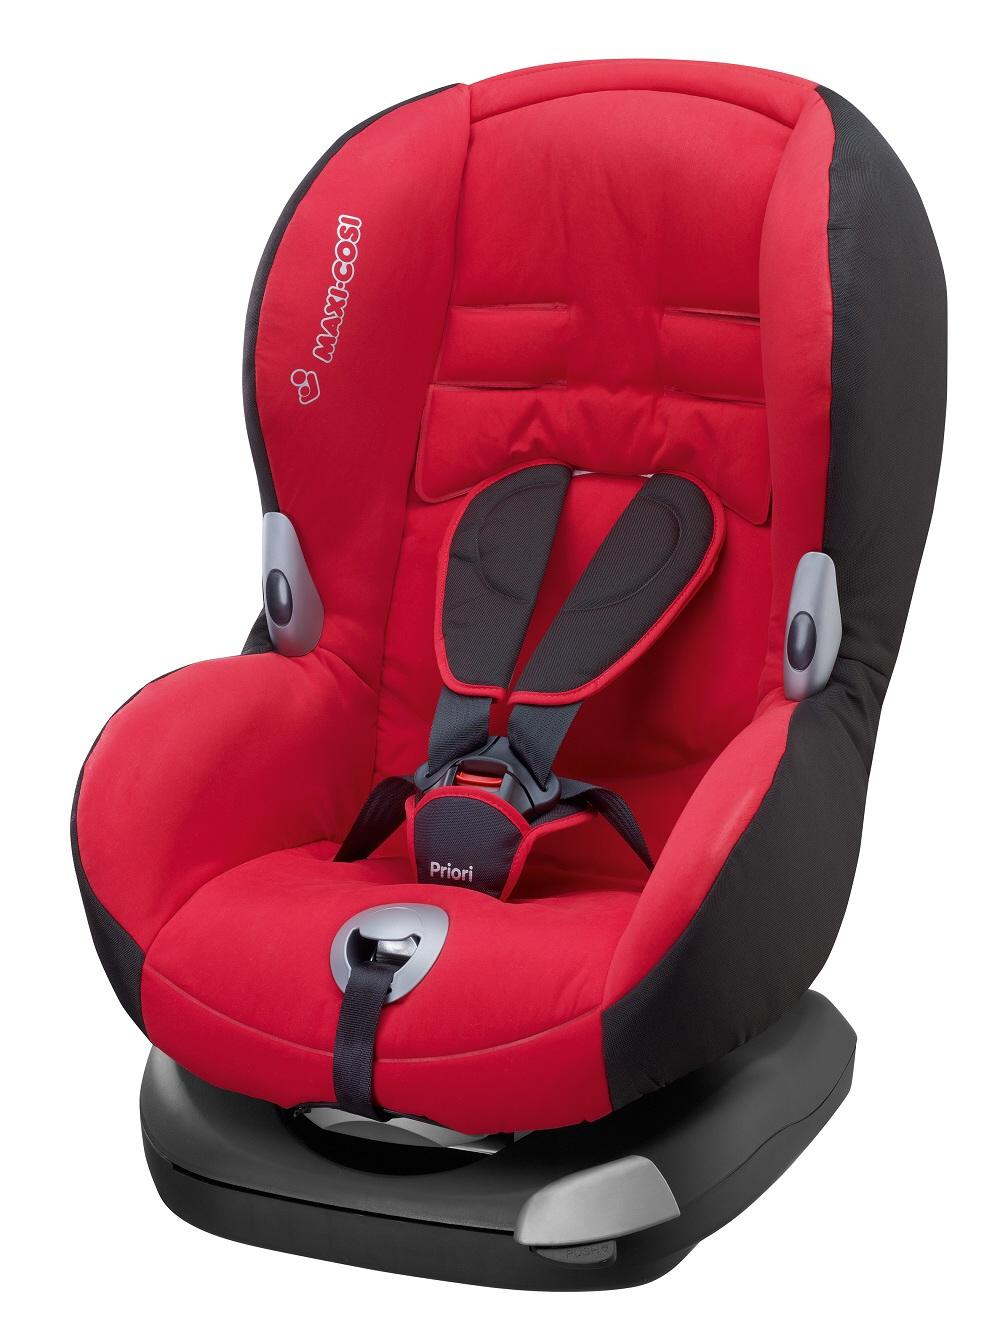 maxi cosi child car seat priori xp 2013 deep red buy at kidsroom car seats. Black Bedroom Furniture Sets. Home Design Ideas